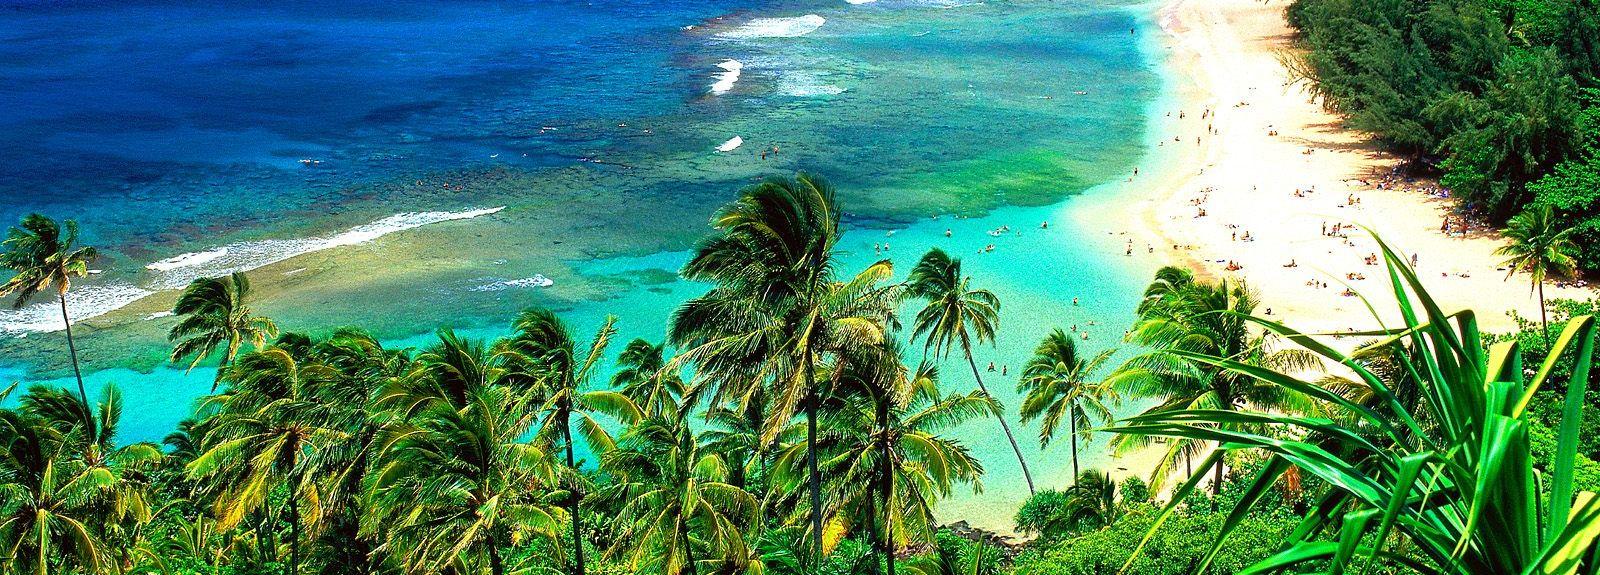 Kaiulani, Princeville, Hawaii, United States of America